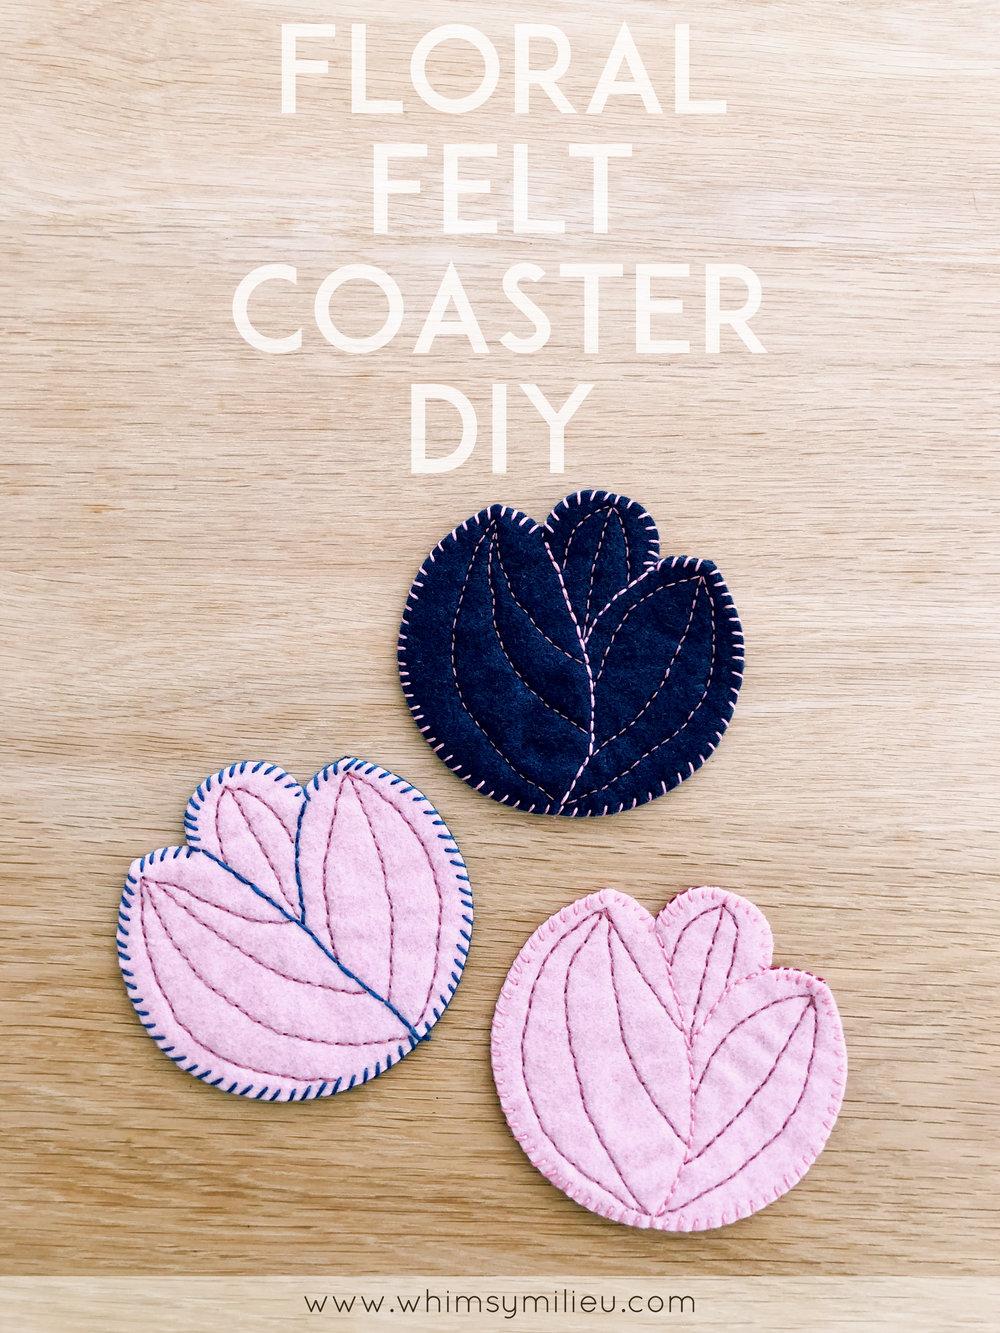 Floral Felt Coaster DIY